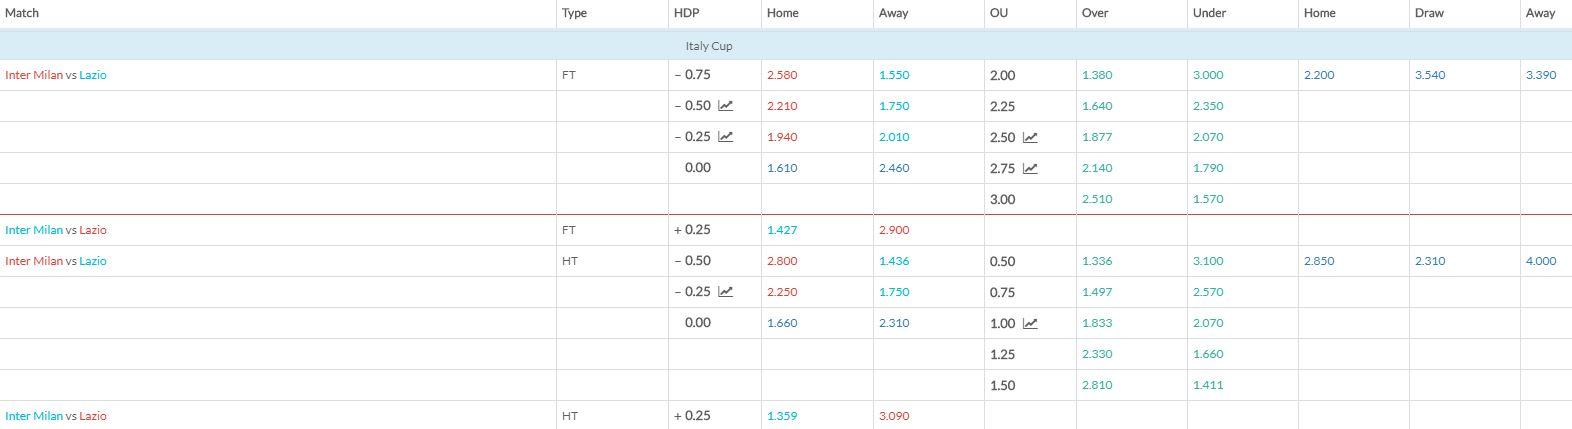 Inter Milan v Lazio match betting odds 310119